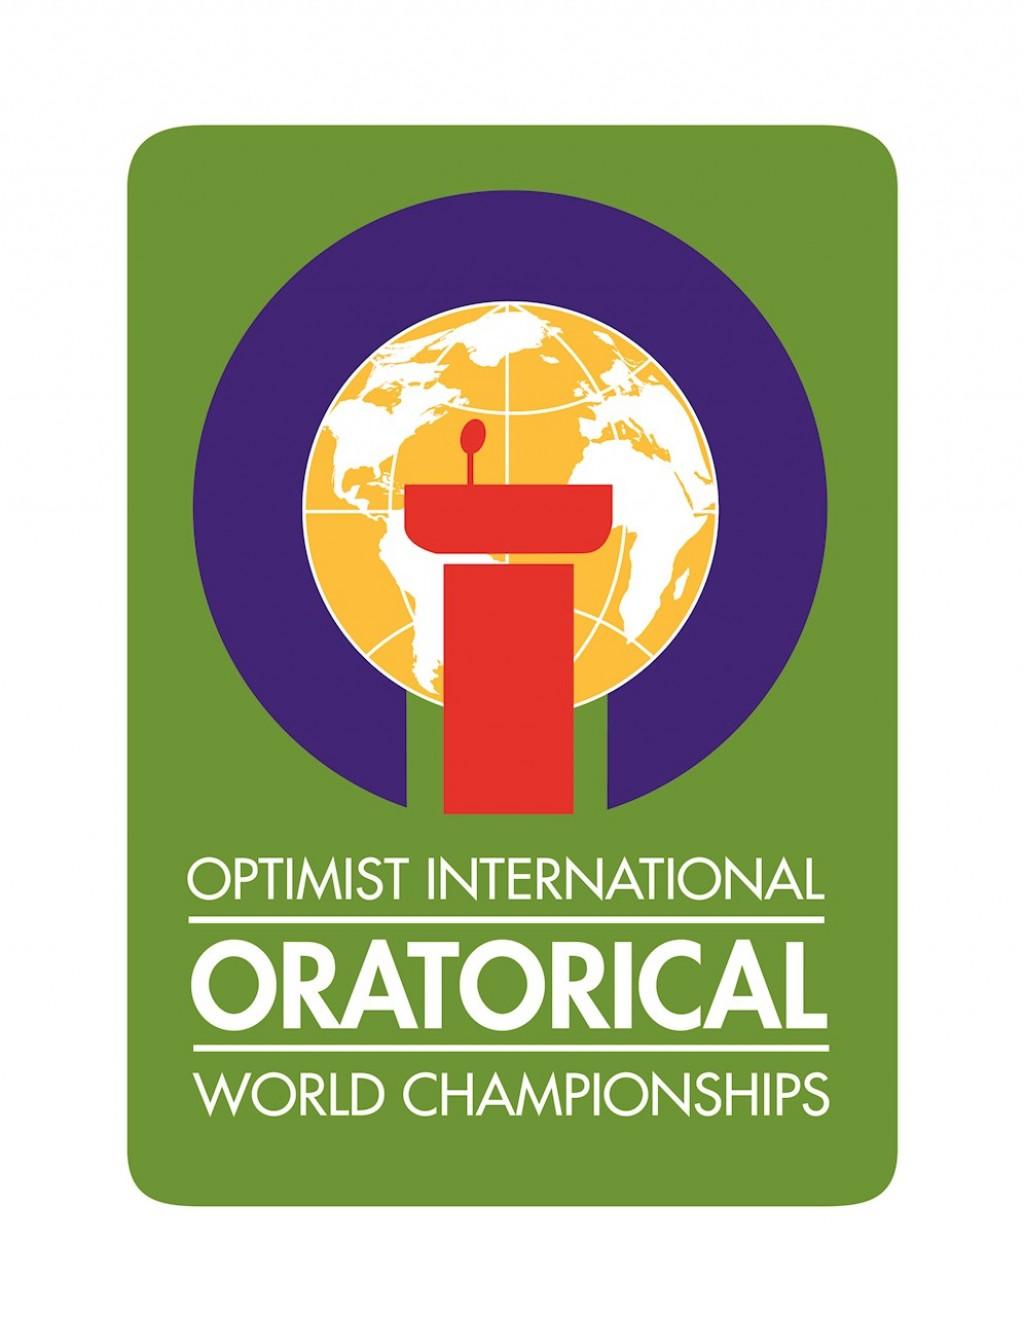 006 Optimist International Essay Contest Example Oratorical High Wondrous Winners Due Date Large